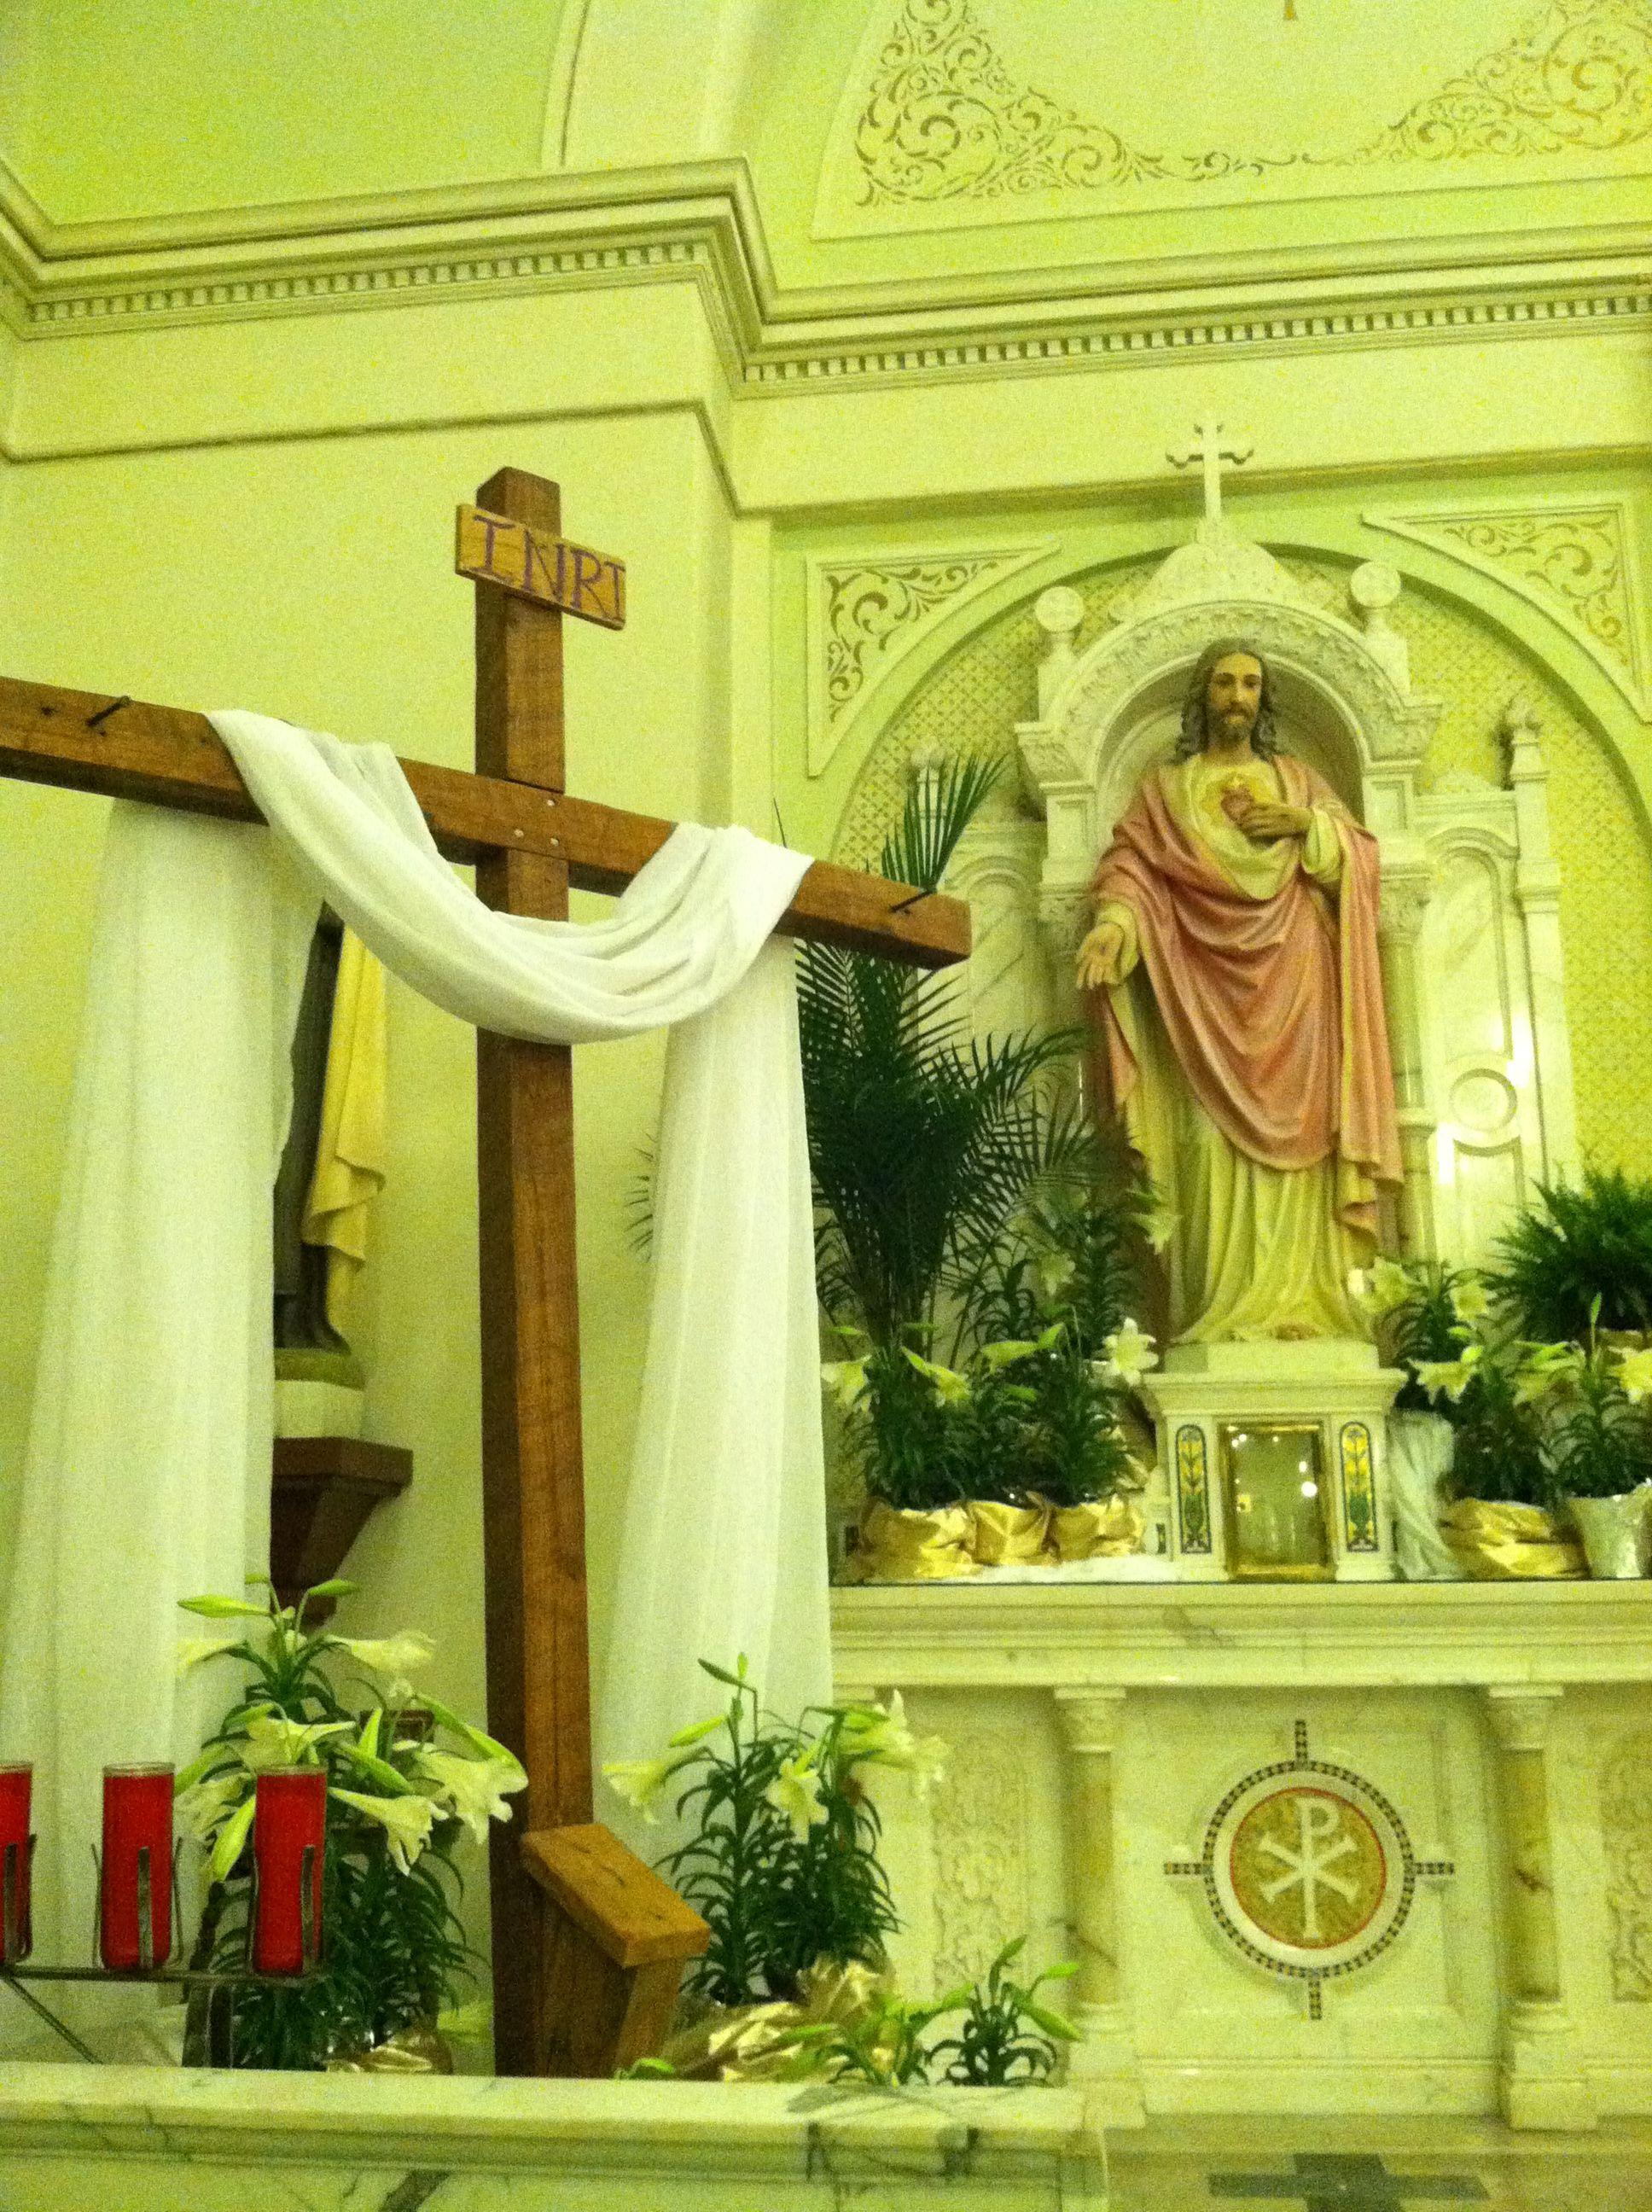 Lent Season in Our Beautiful Chruch St.Edwards Catholic Church in Texarkana, Ar